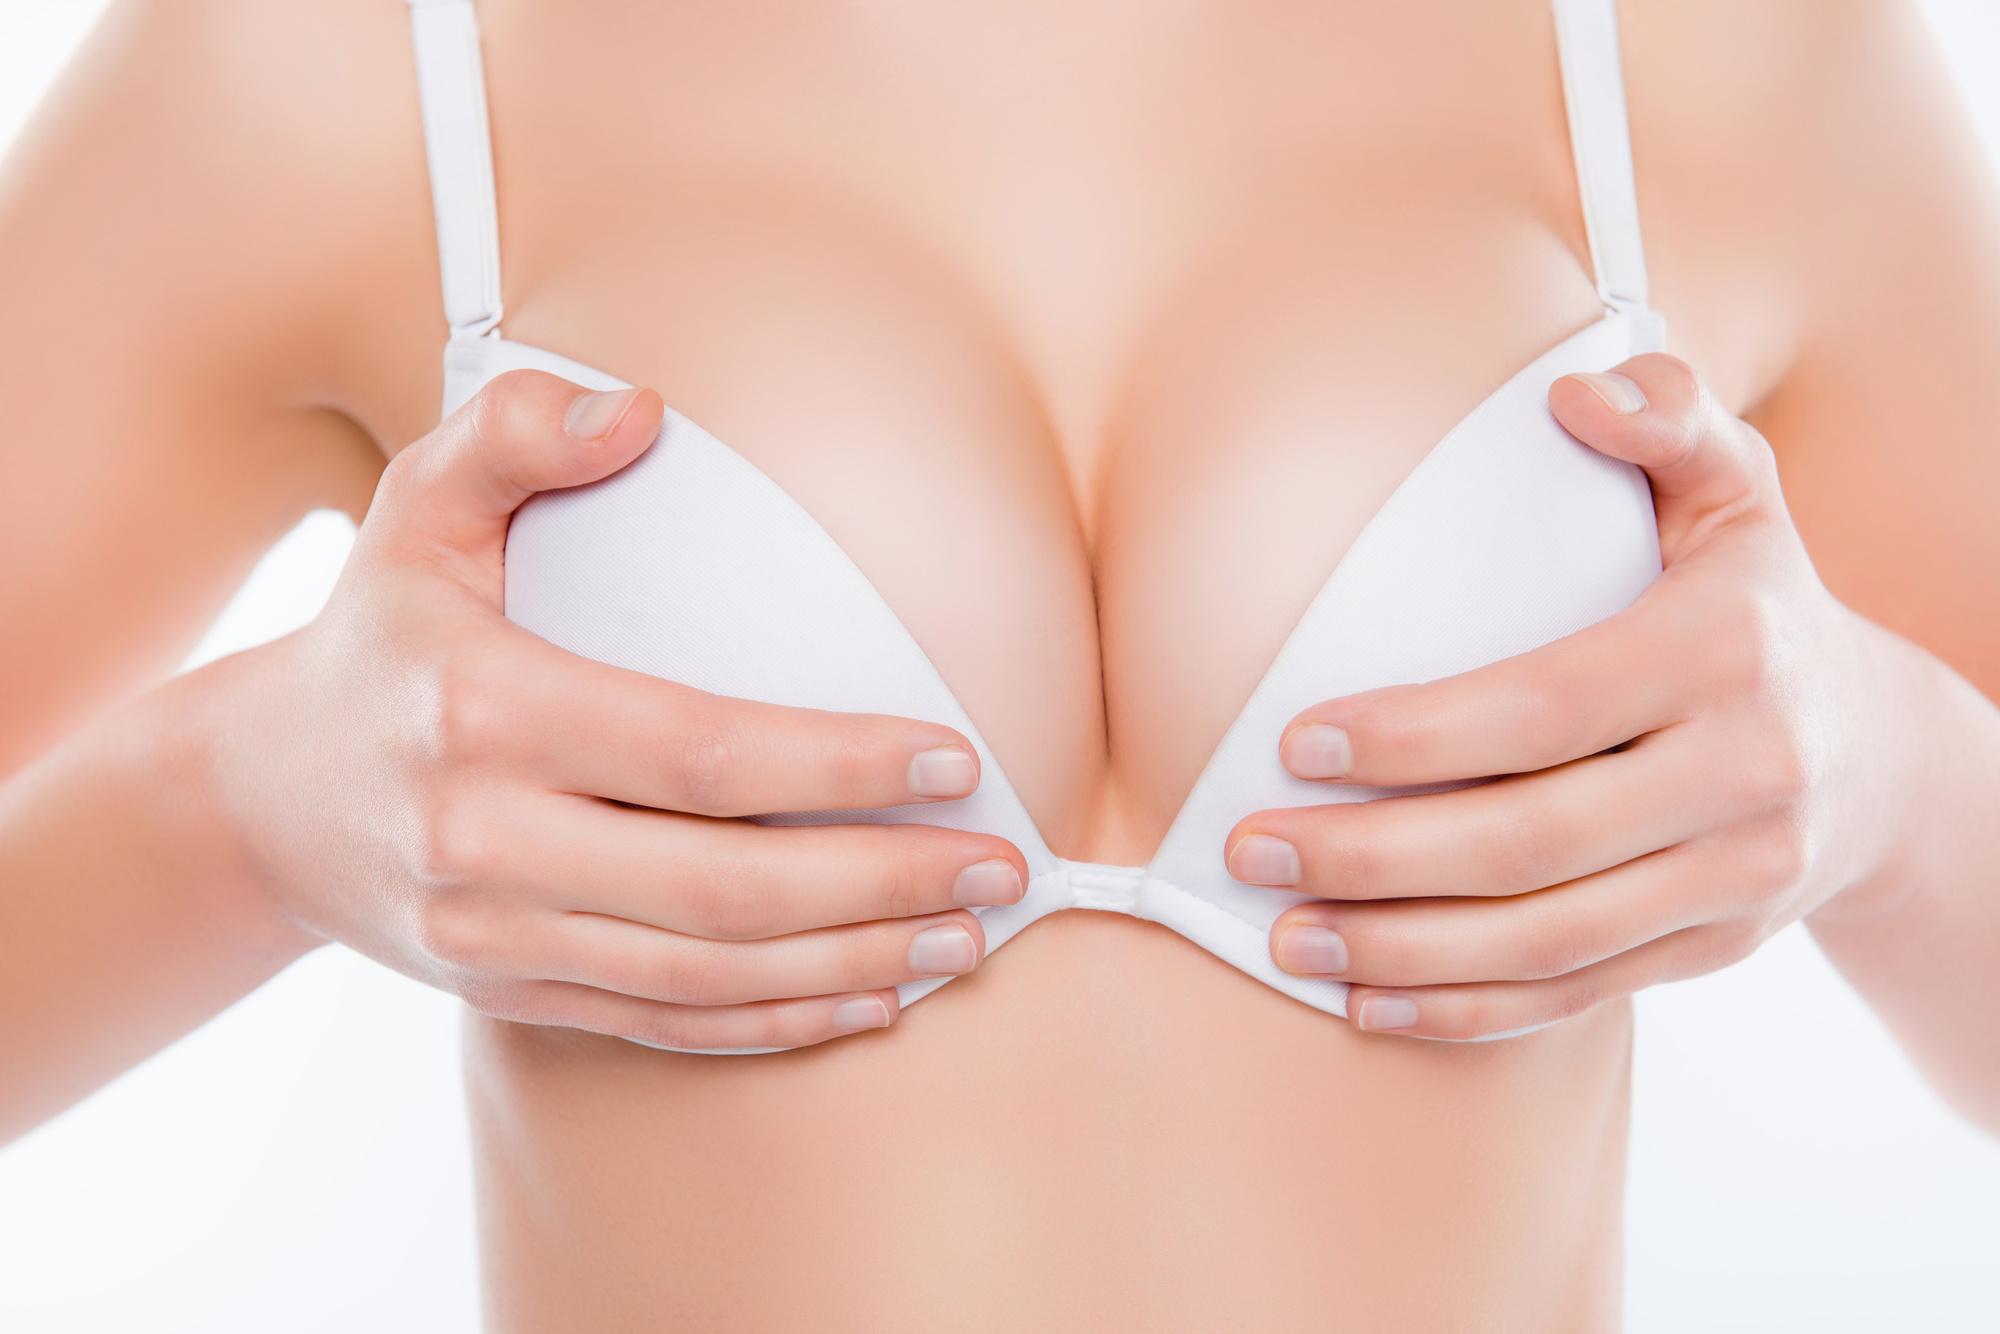 massage-techniques-for-natural-breast-enhancement